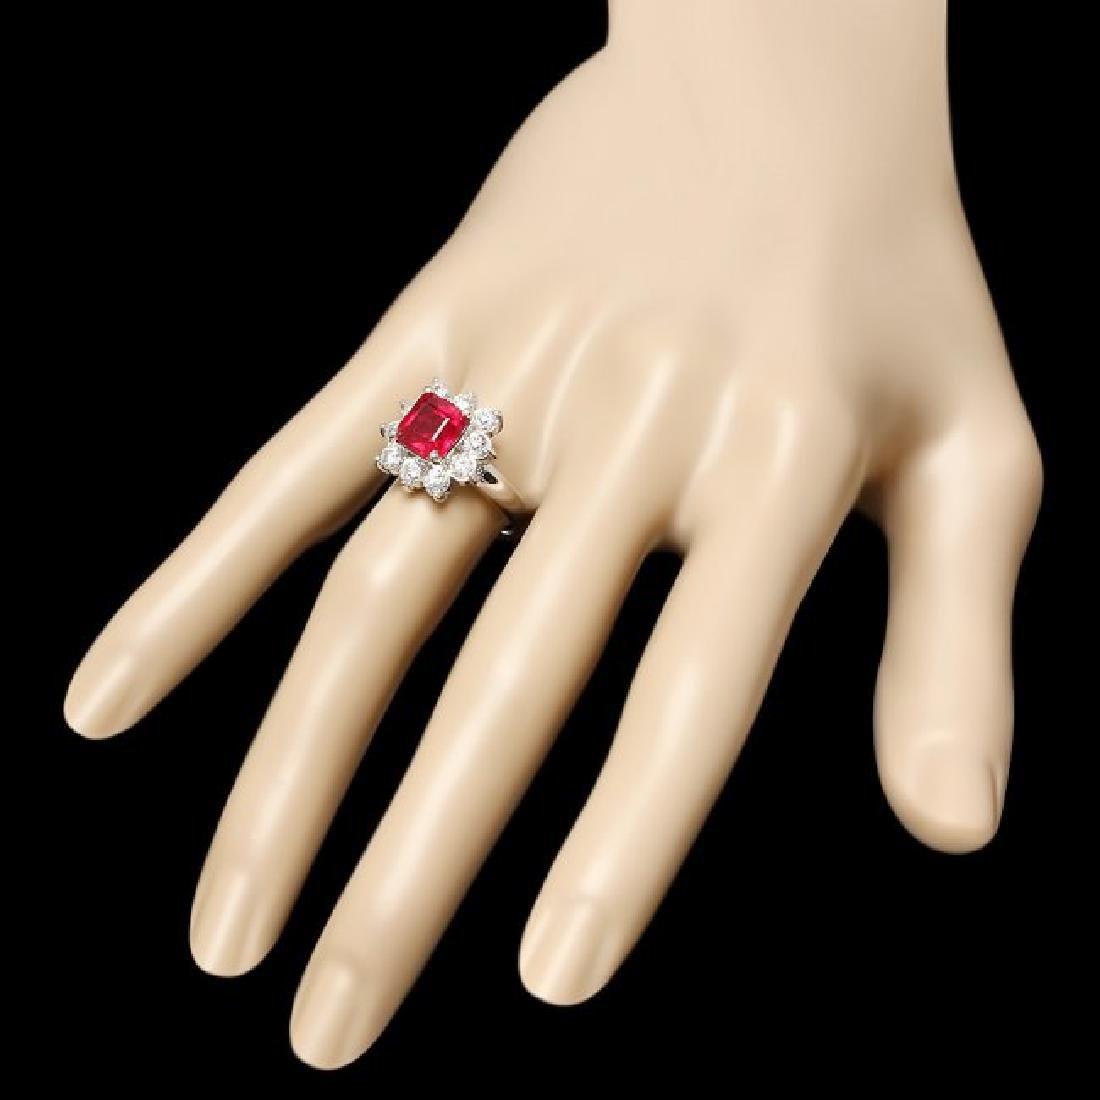 14k White Gold 3.40ct Ruby 1.25ct Diamond Ring - 3